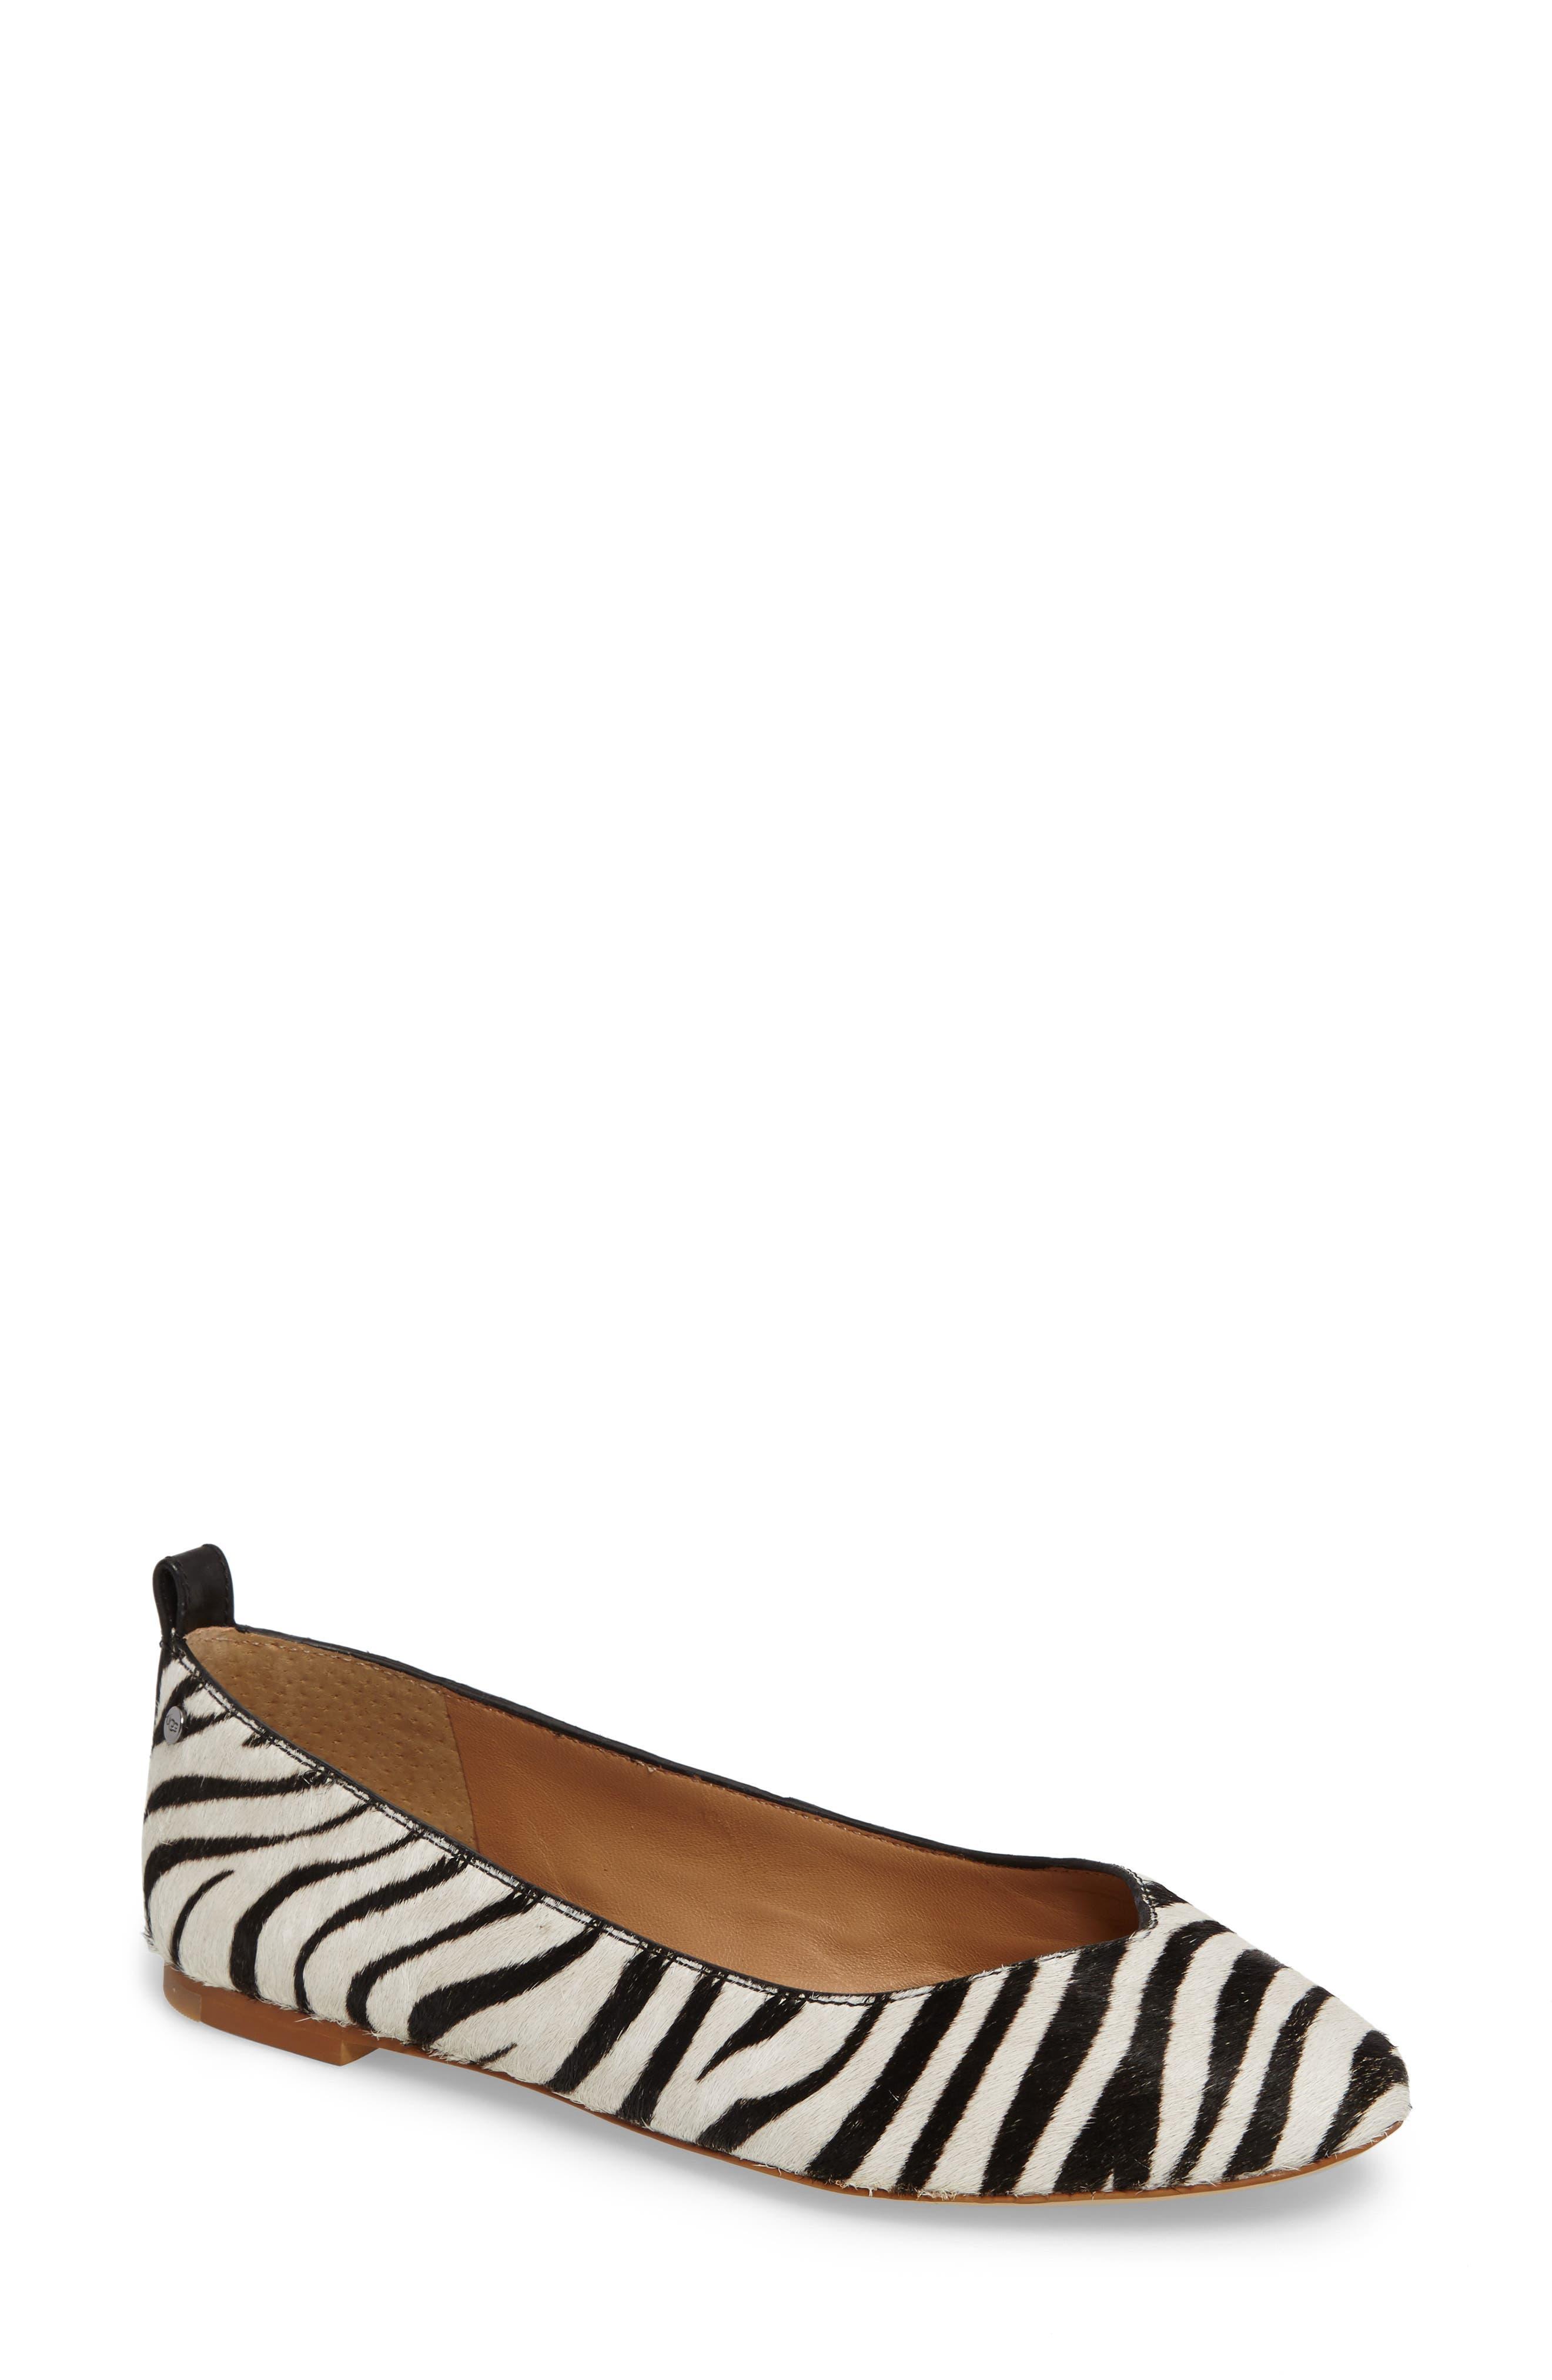 Lynley Genuine Calf Hair Flat,                             Main thumbnail 1, color,                             Zebra Calf Hair Leather